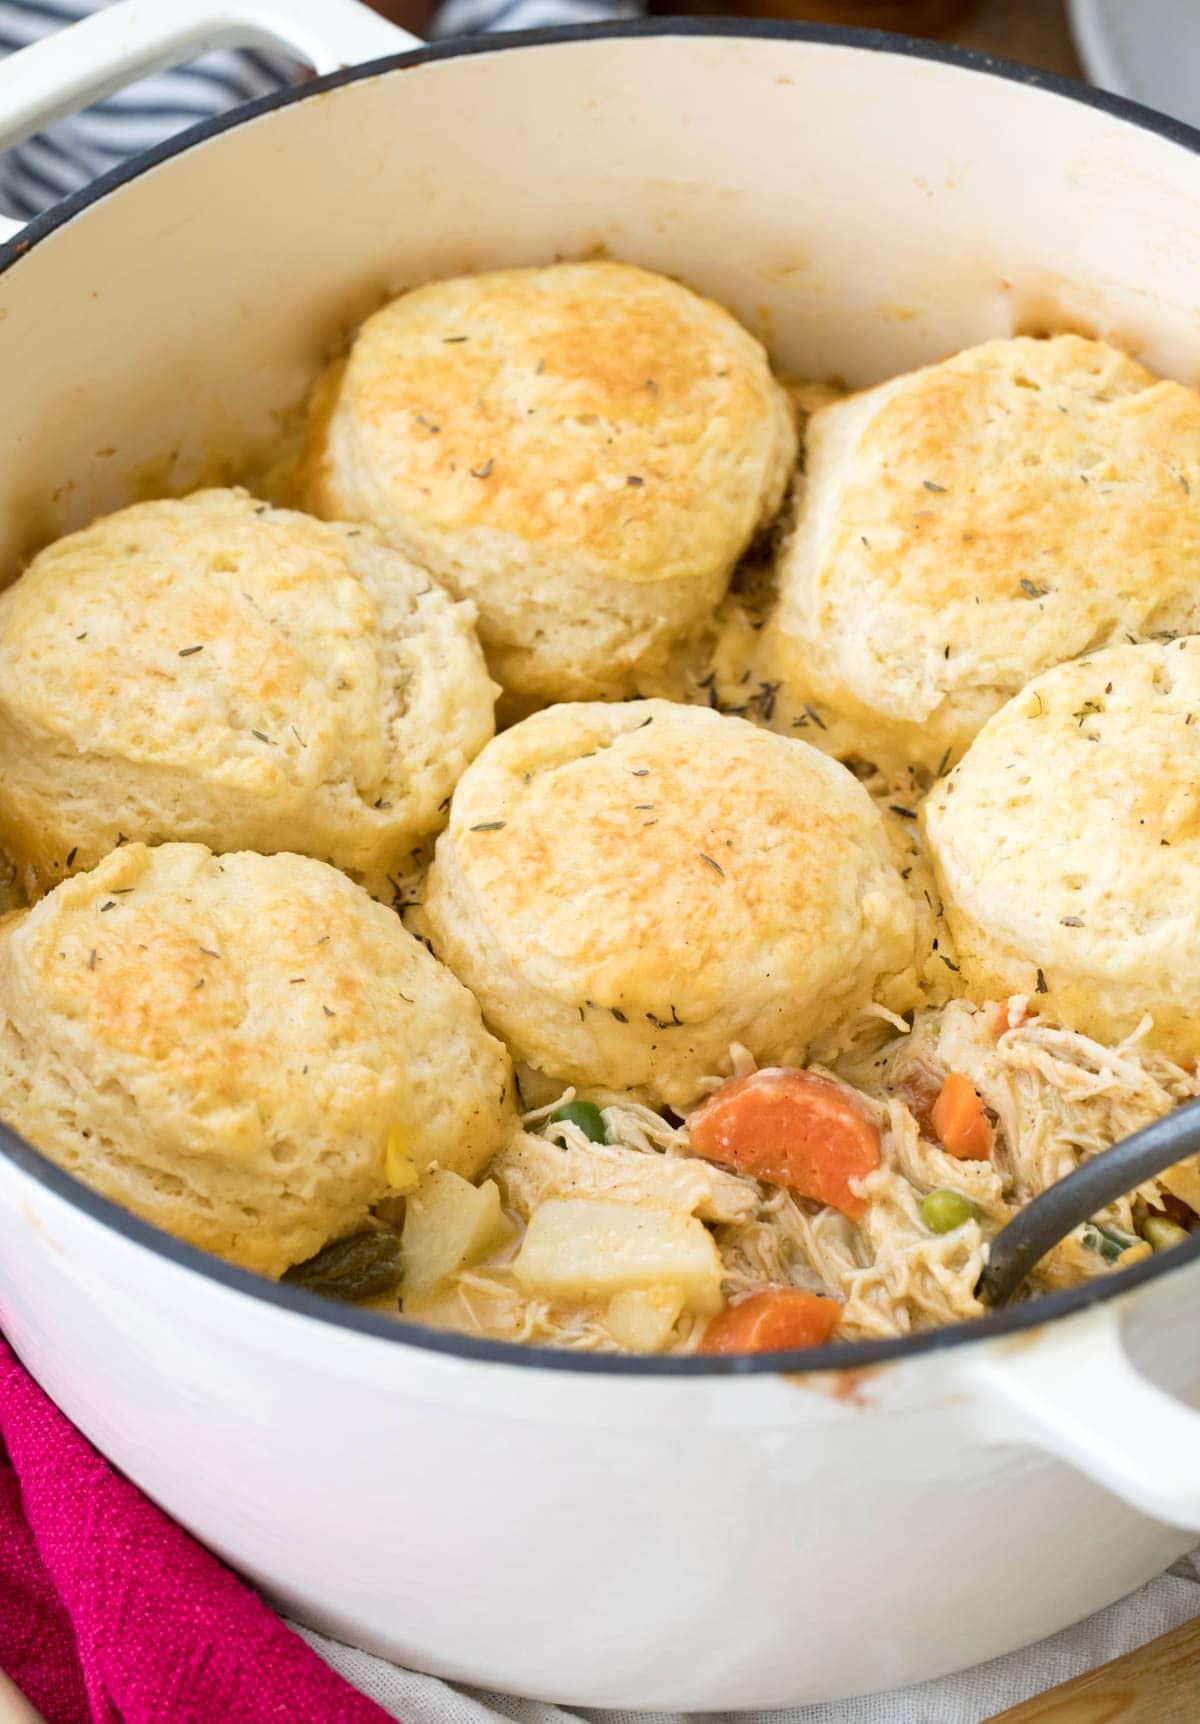 biscuits on top of pot of pot pie